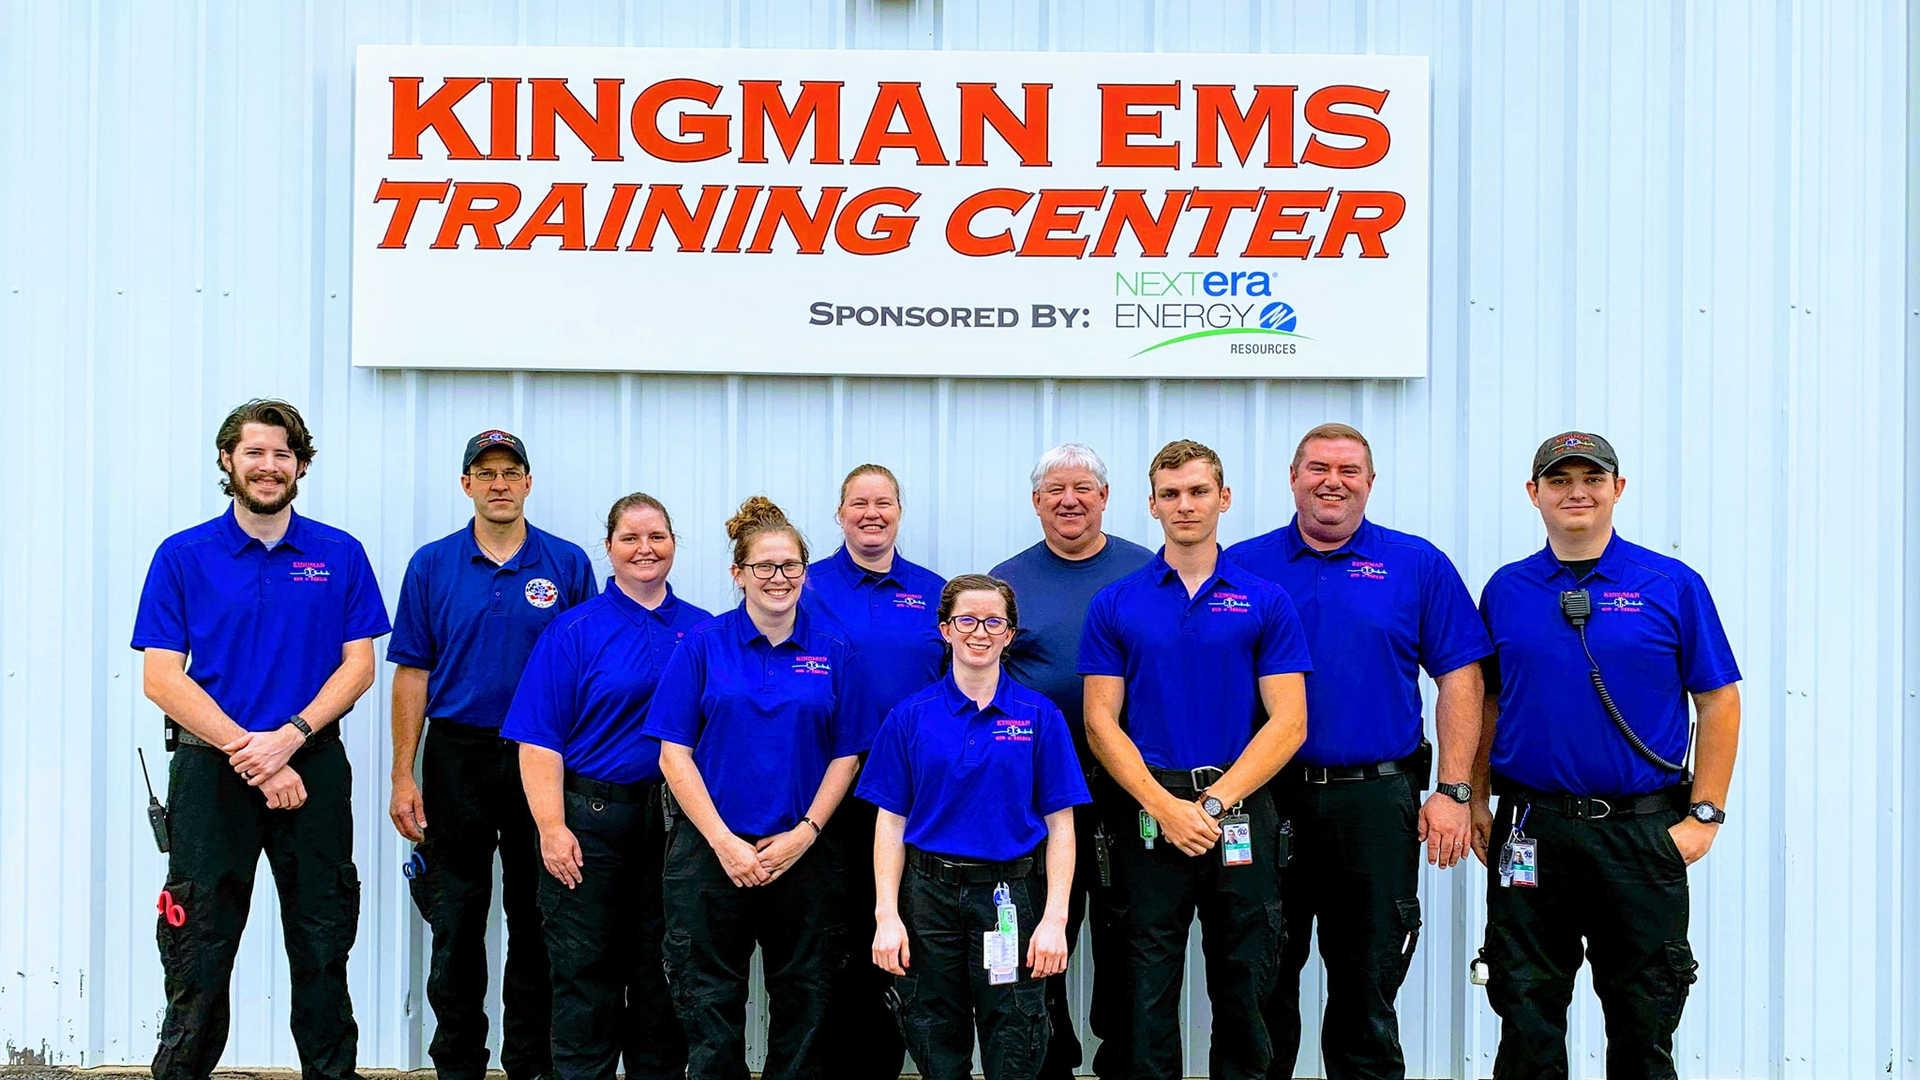 Kingman EMS